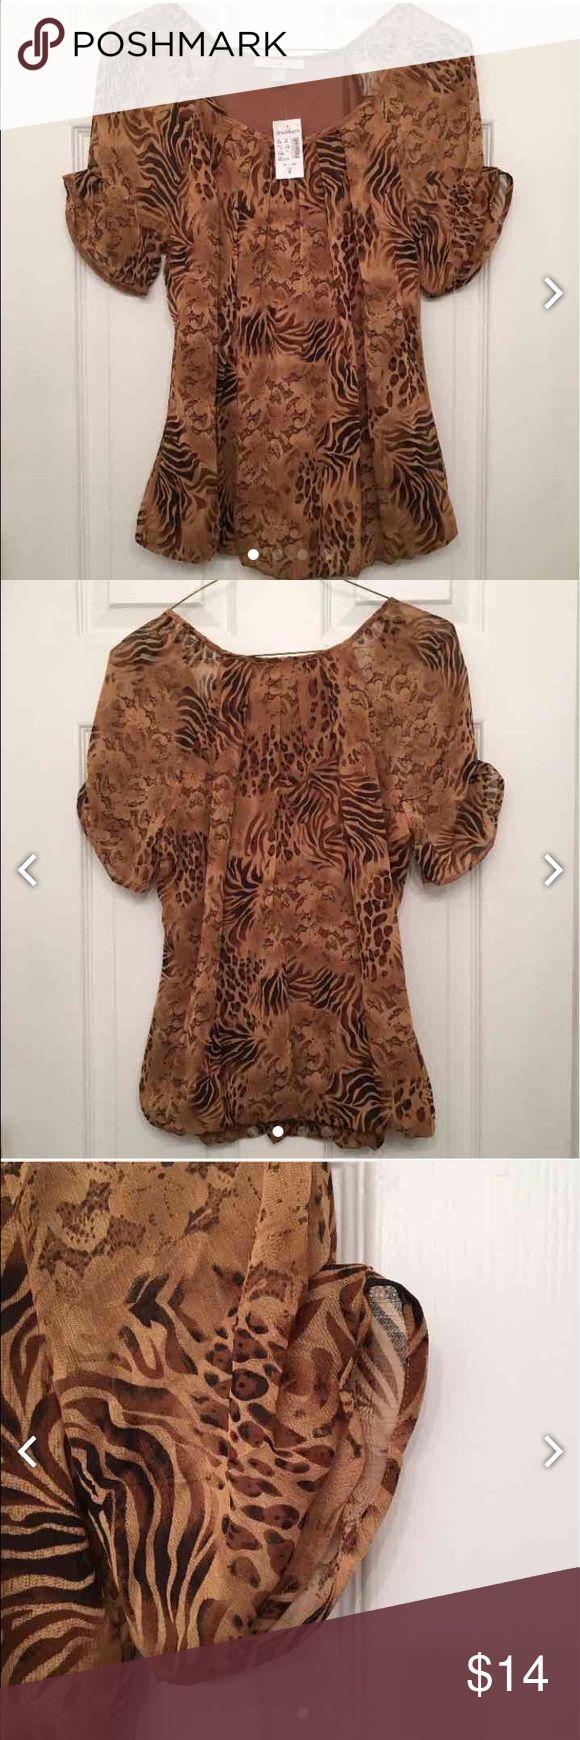 Women's Dress Shirt Very cute animal print dress shirt, sold by dressbarn. Dress Barn Tops Blouses